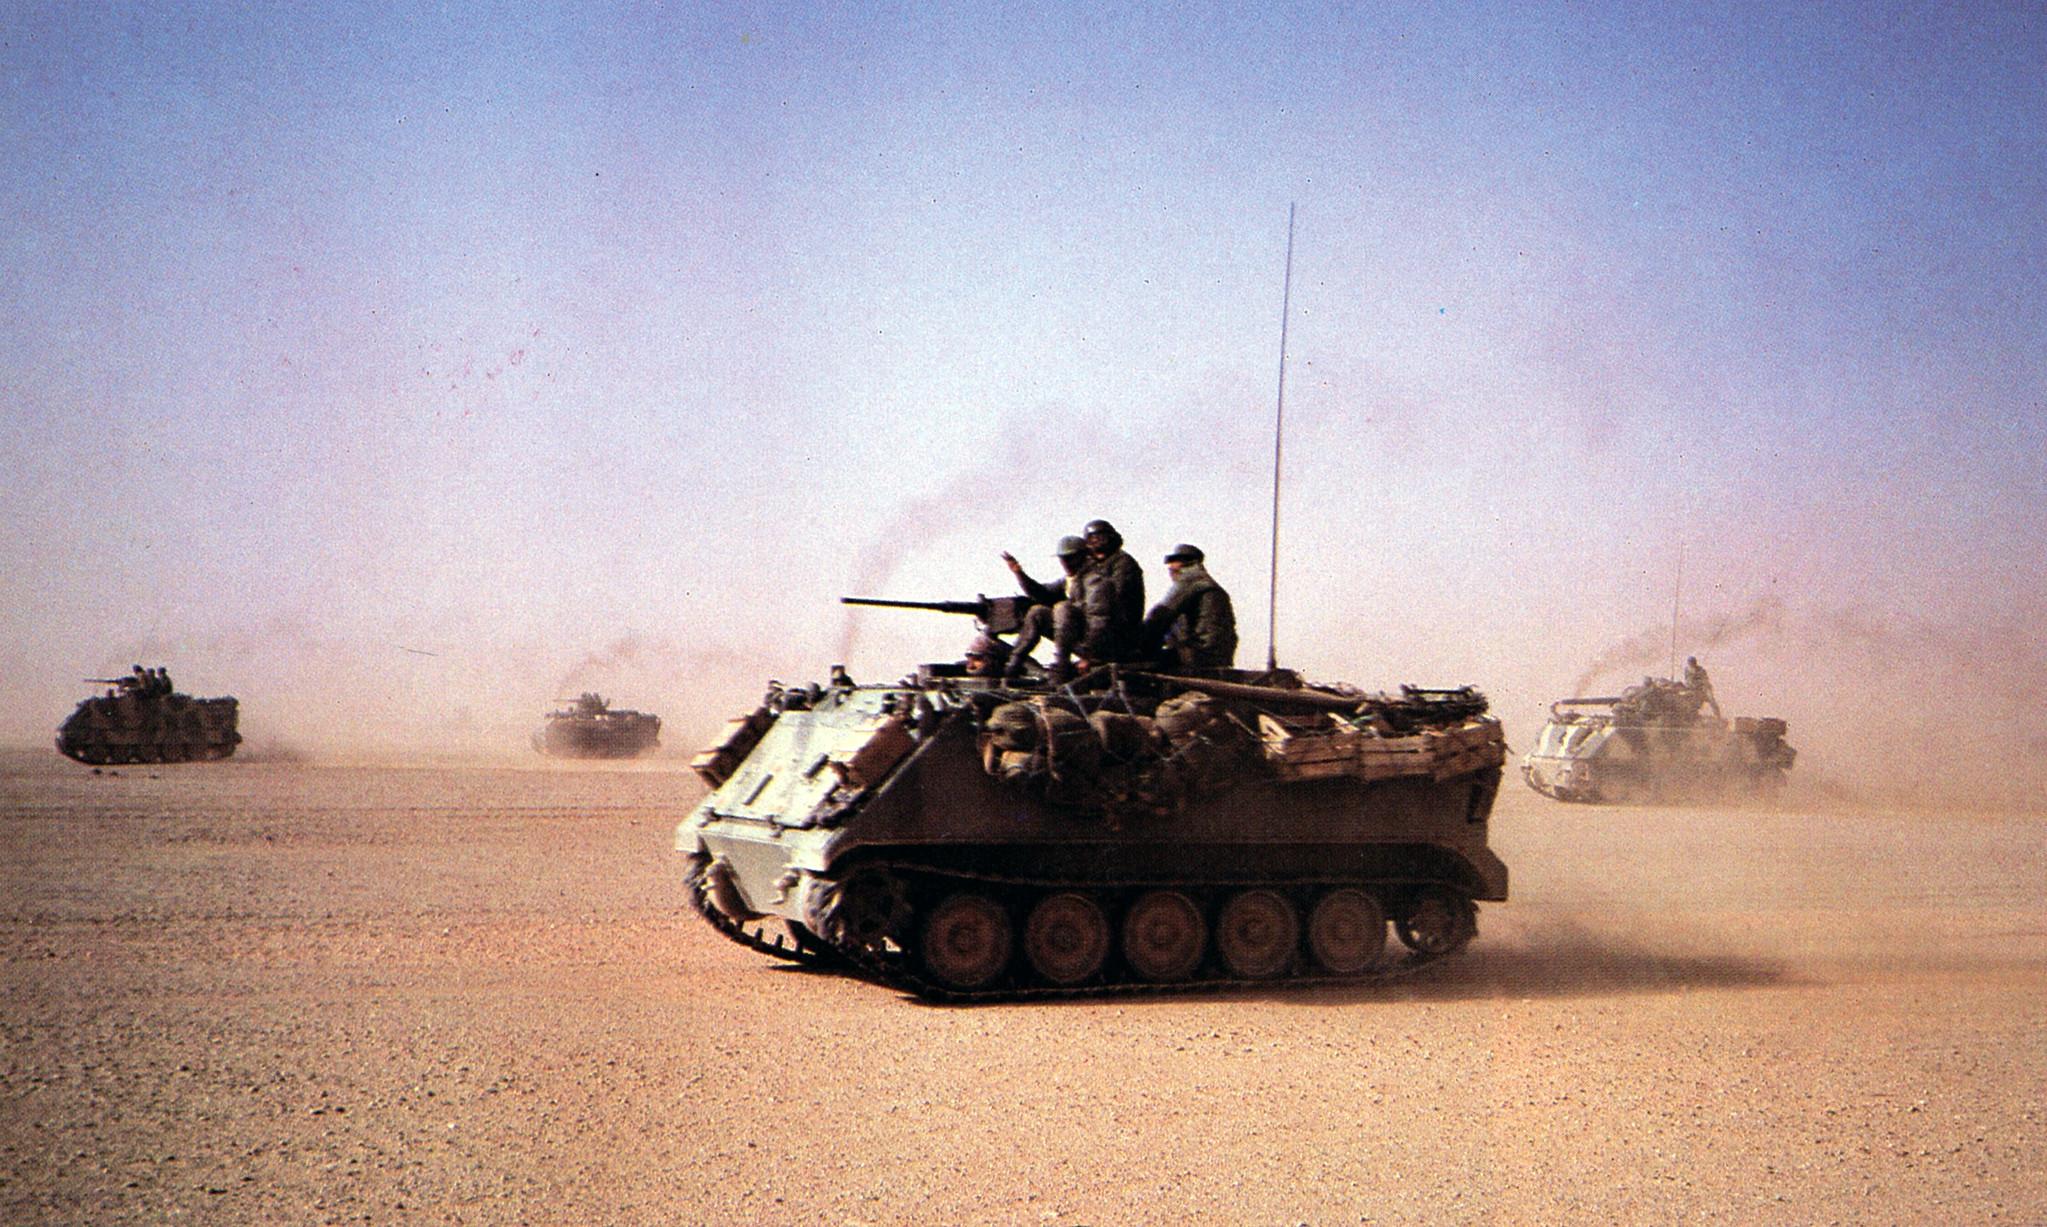 Le conflit armé du sahara marocain - Page 16 51223505496_a4290c6c79_k_d